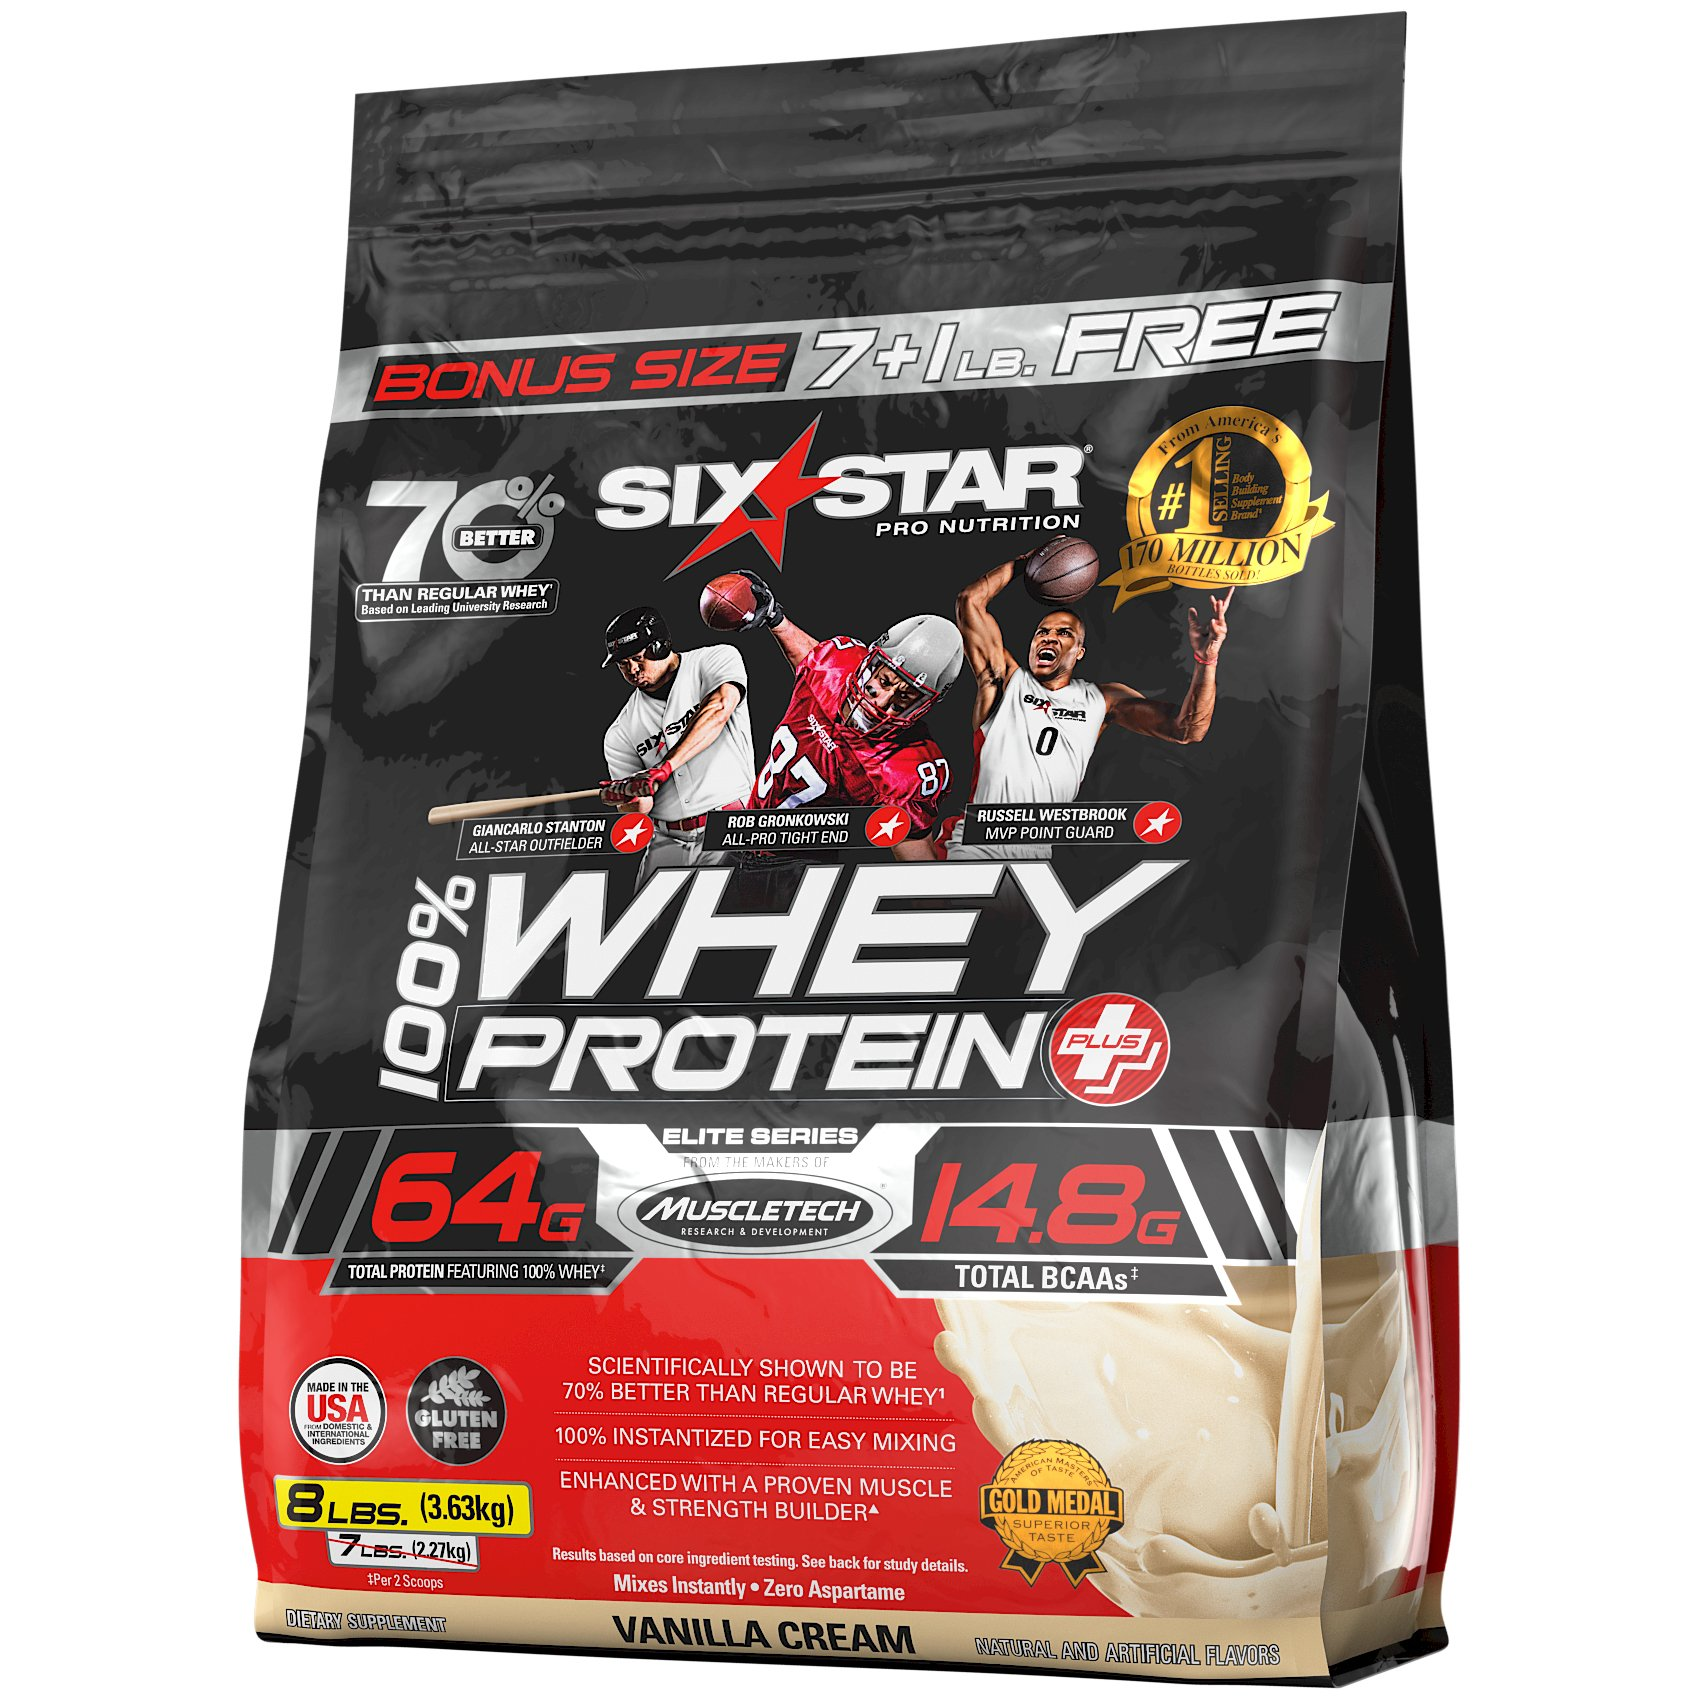 Six Star Pro Nutrition Whey Protein Plus, 8 Pound